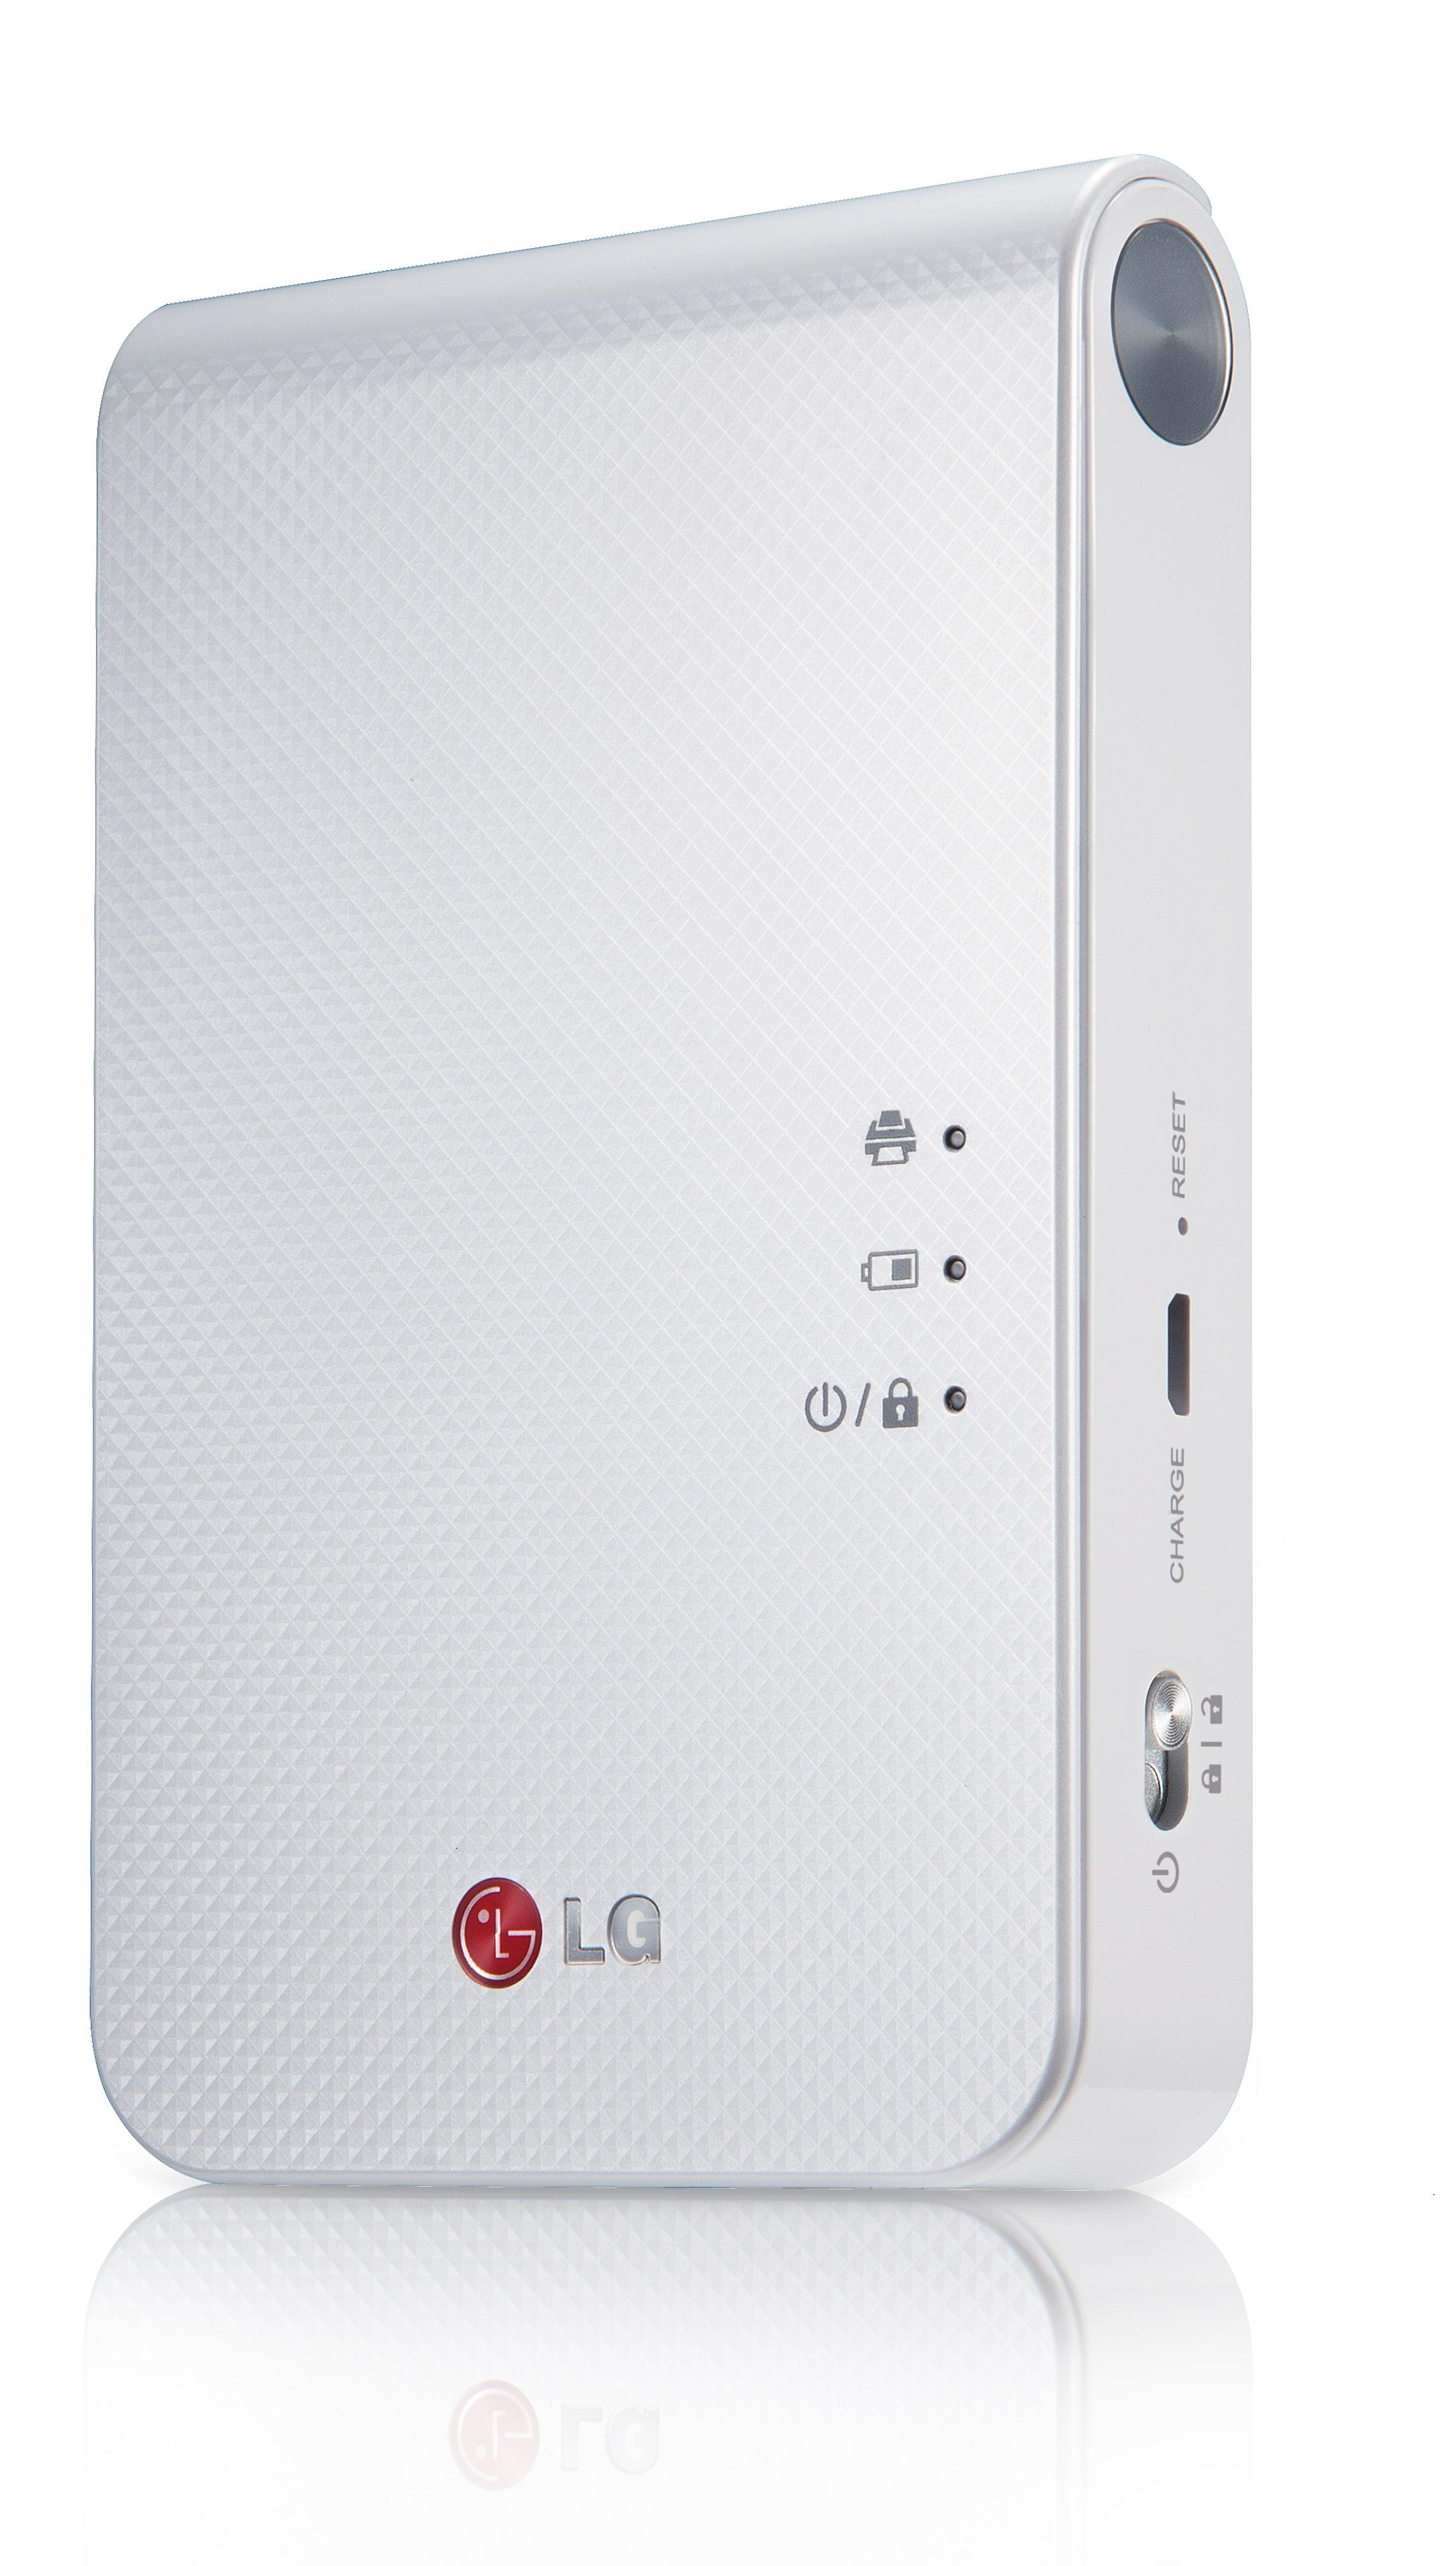 Mini-imprimante LG Pocket photo 2.0 PD239